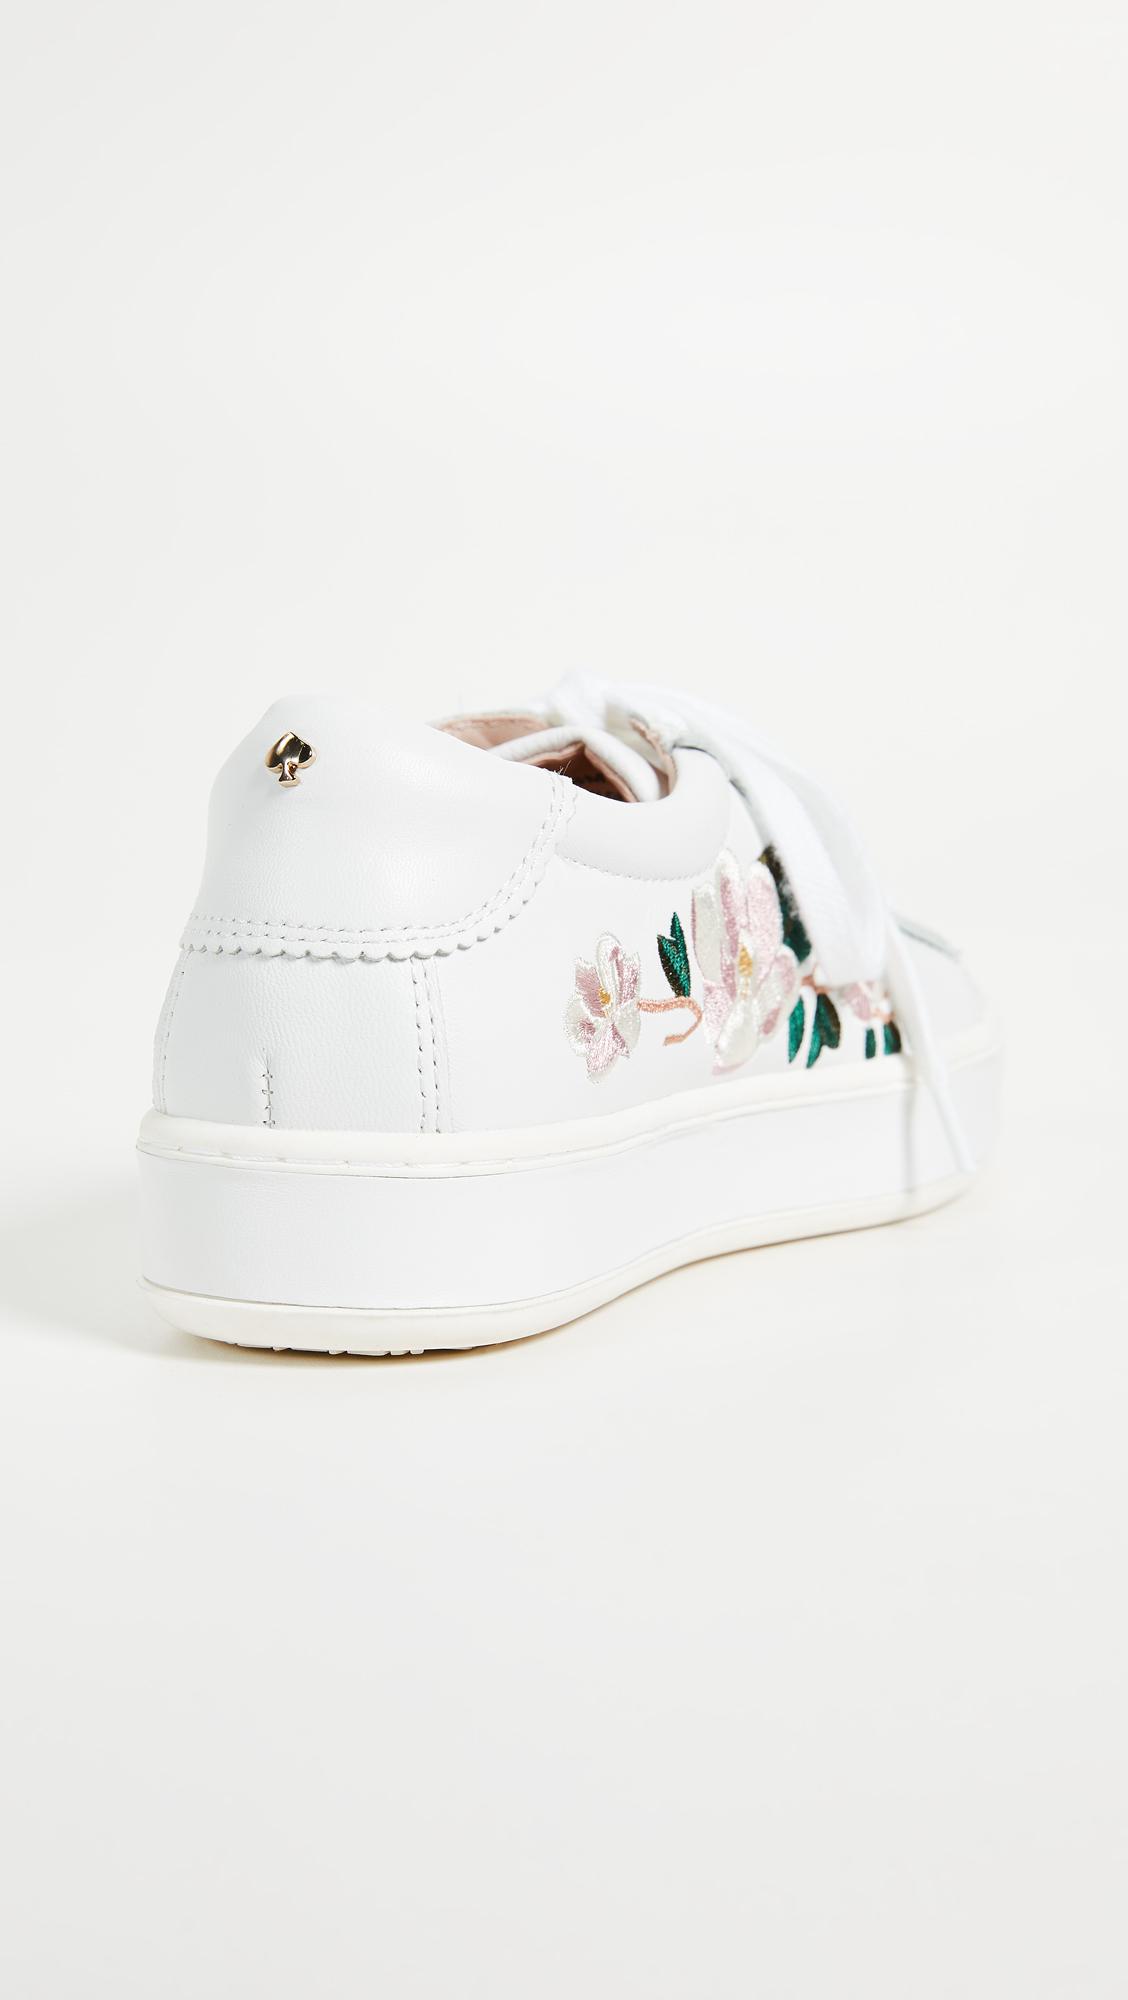 H?gl Floral toe cap sneakers Find Great Sale Online JSSoKh14